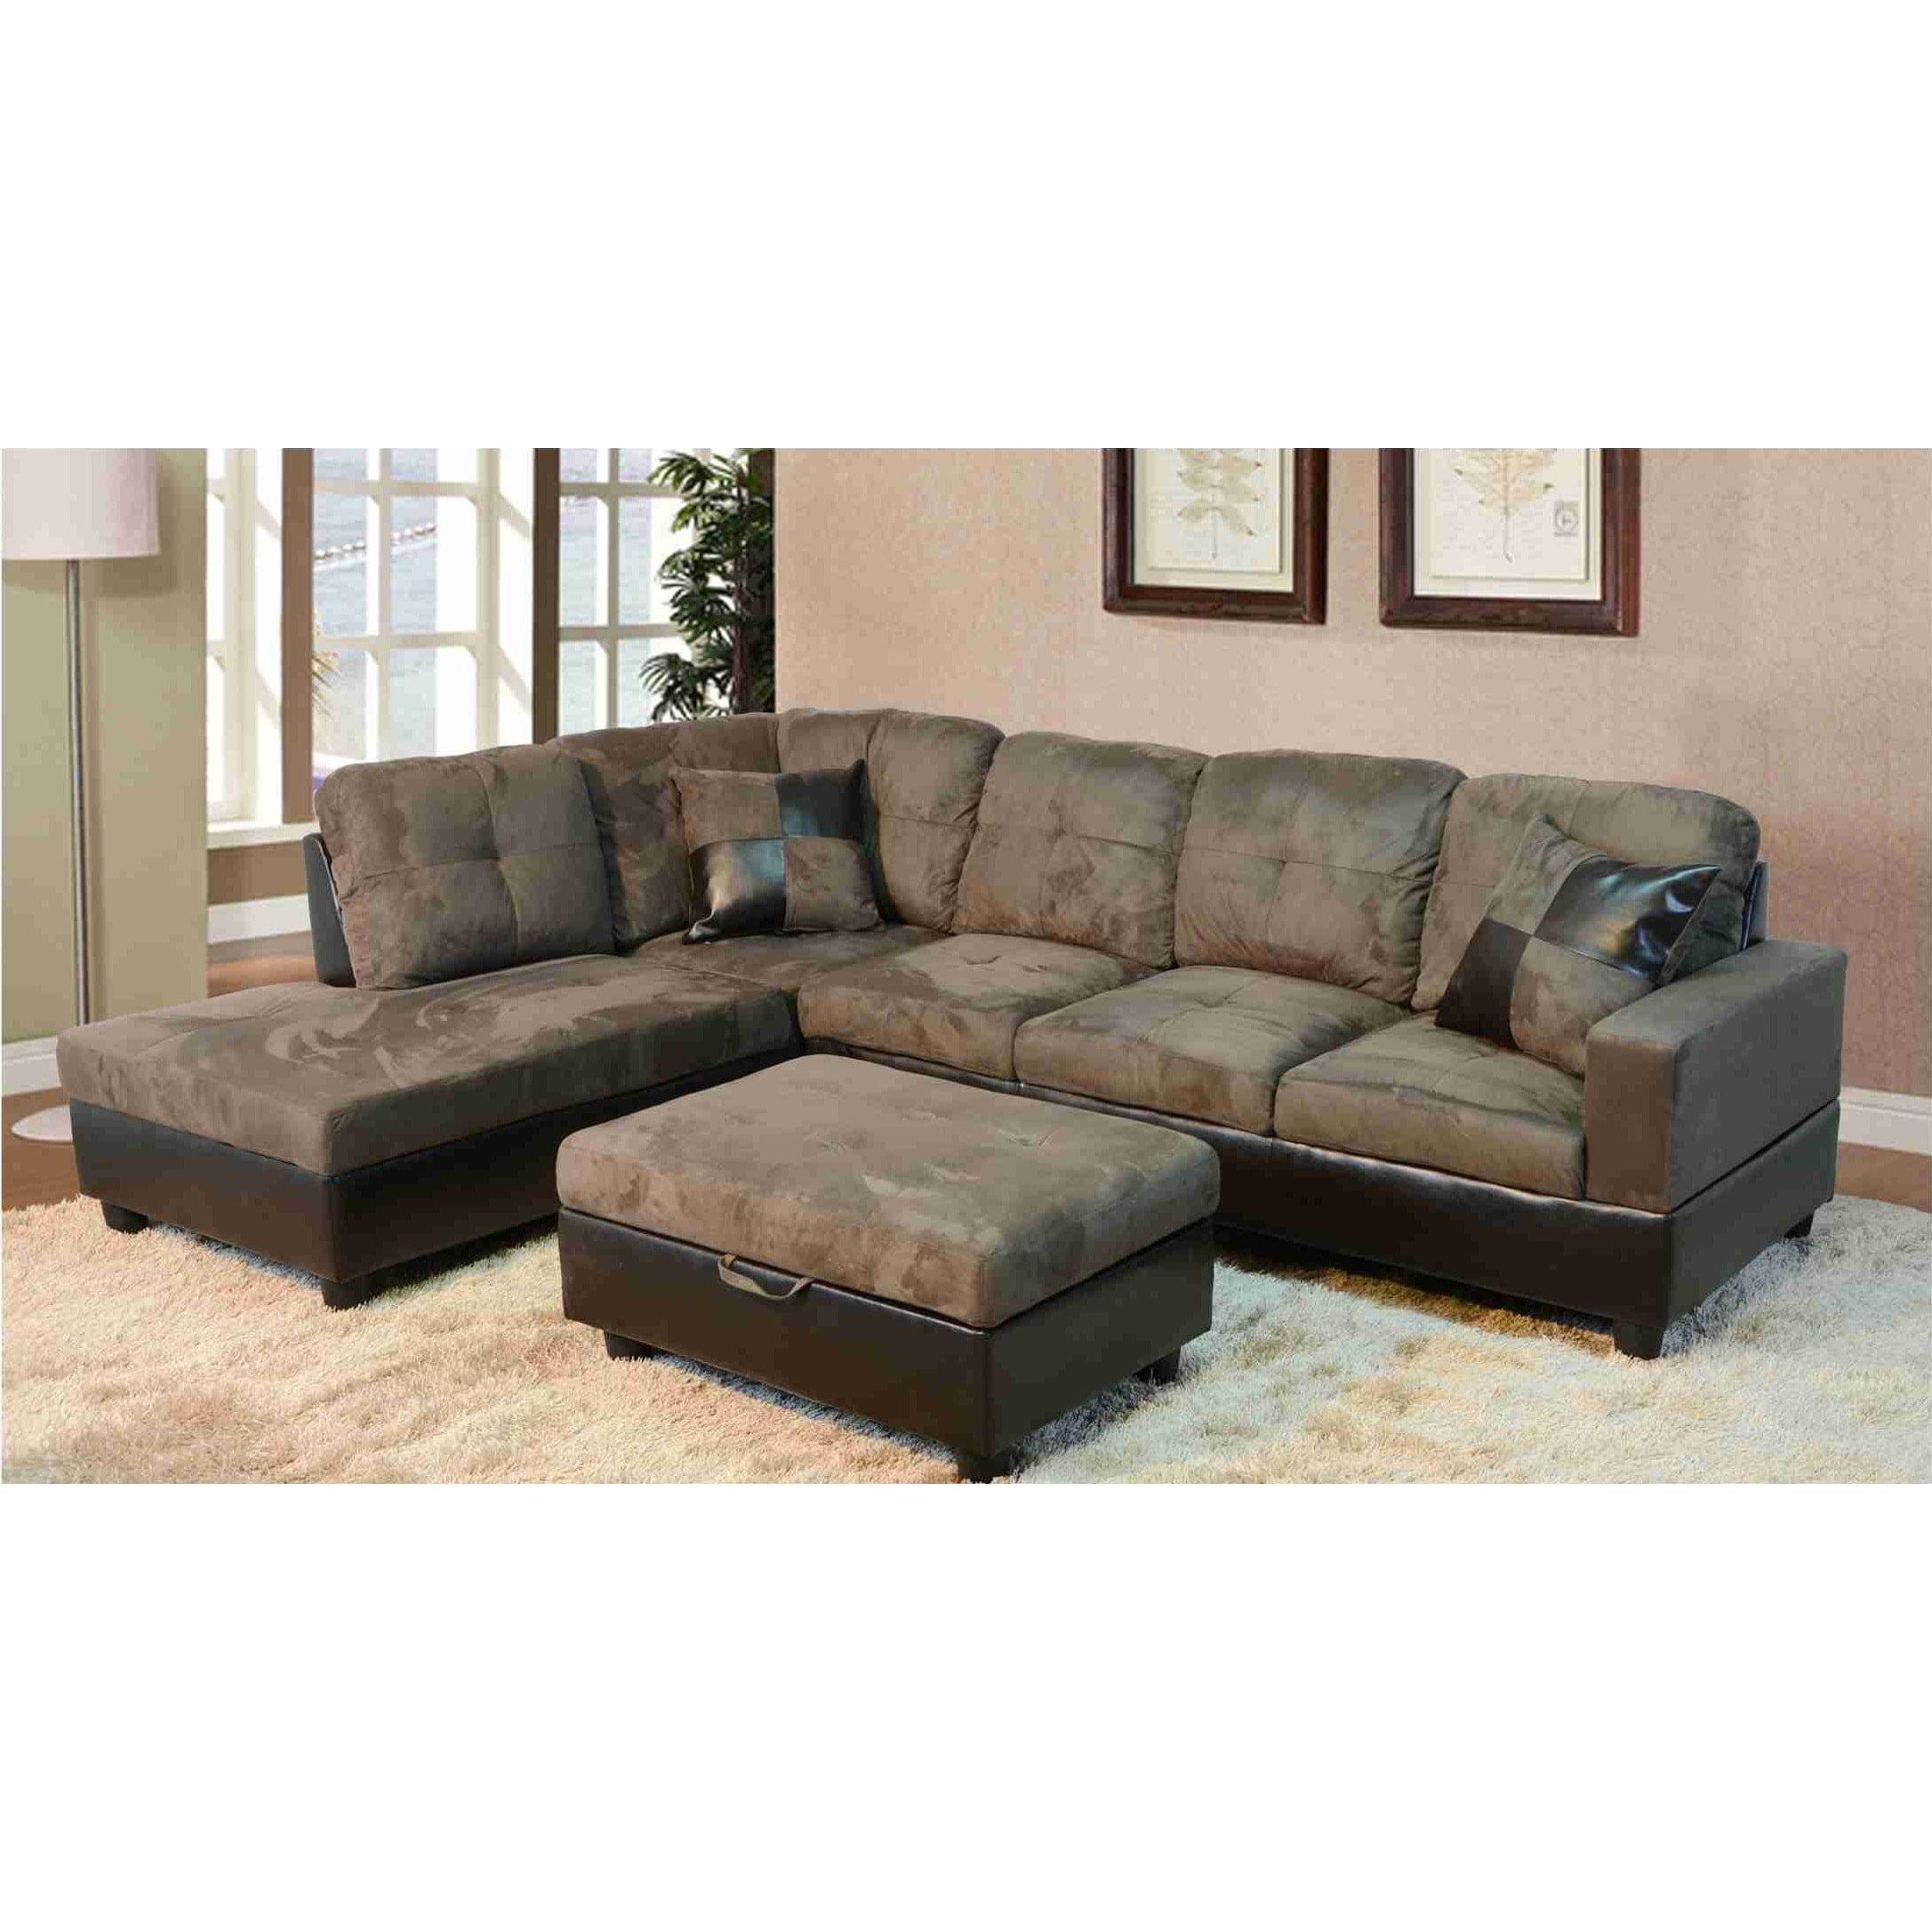 Lifestyle Furniture Lf102a Avellino Left Hand Facing Sectional Sofa 44 Olive Green 35 X 103 5 X 74 5 In Walmart Com Walmart Com